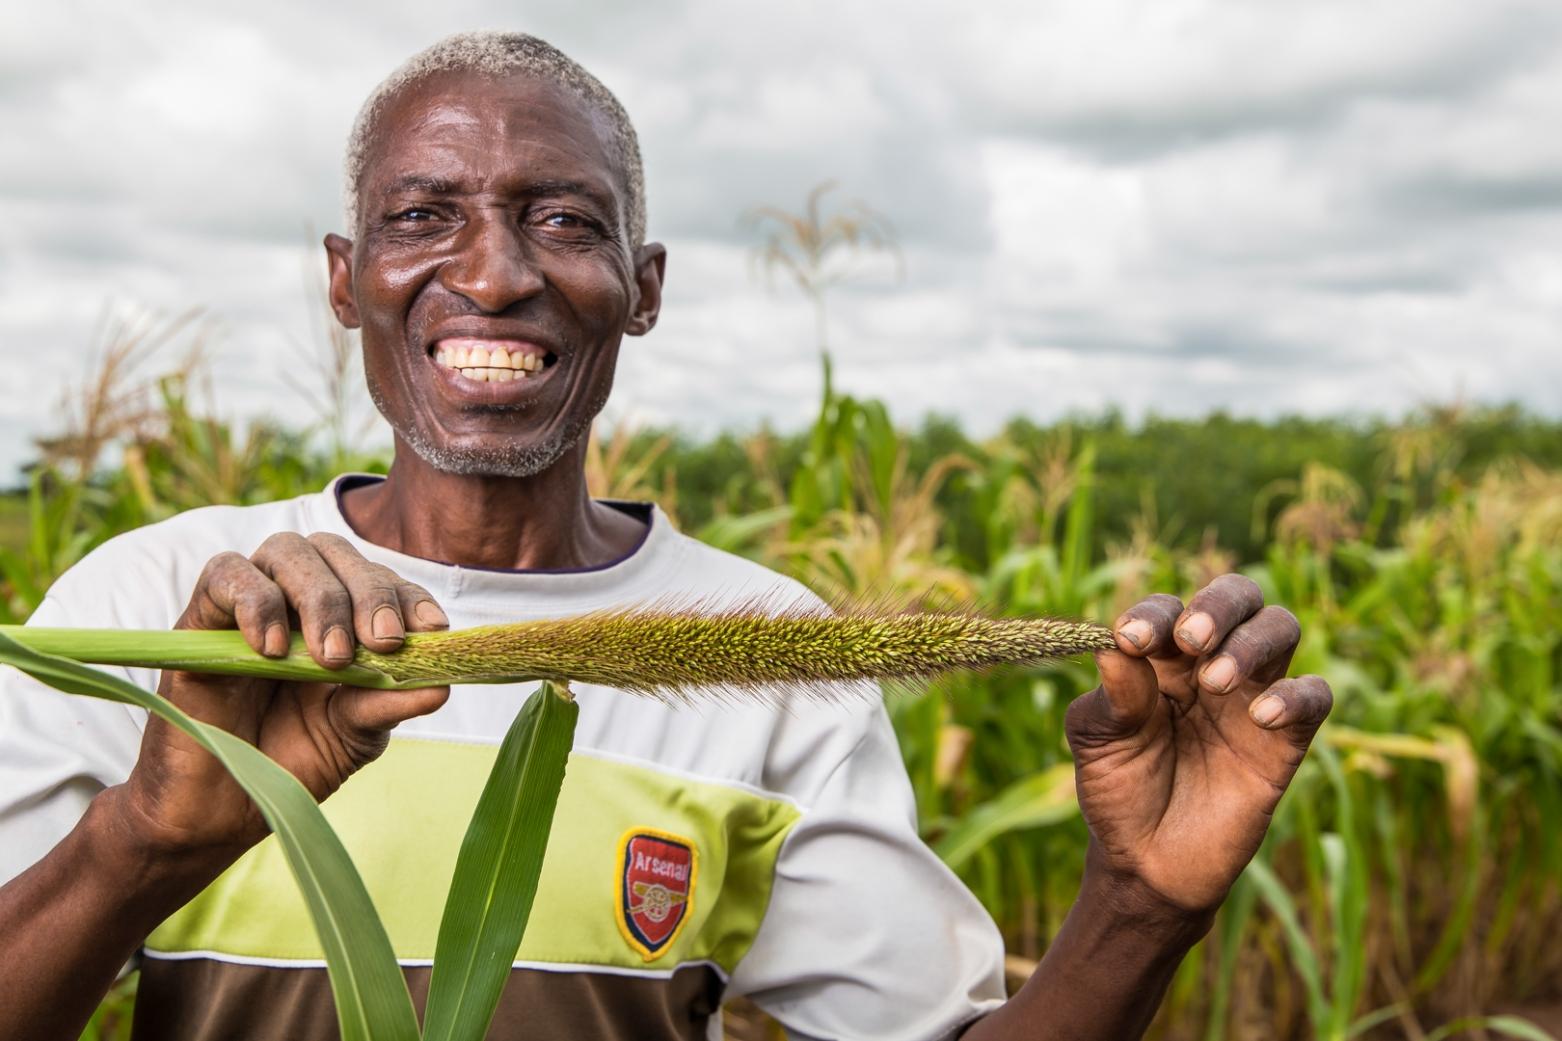 Smallholder farmer in Zambia supplying CHC commodities